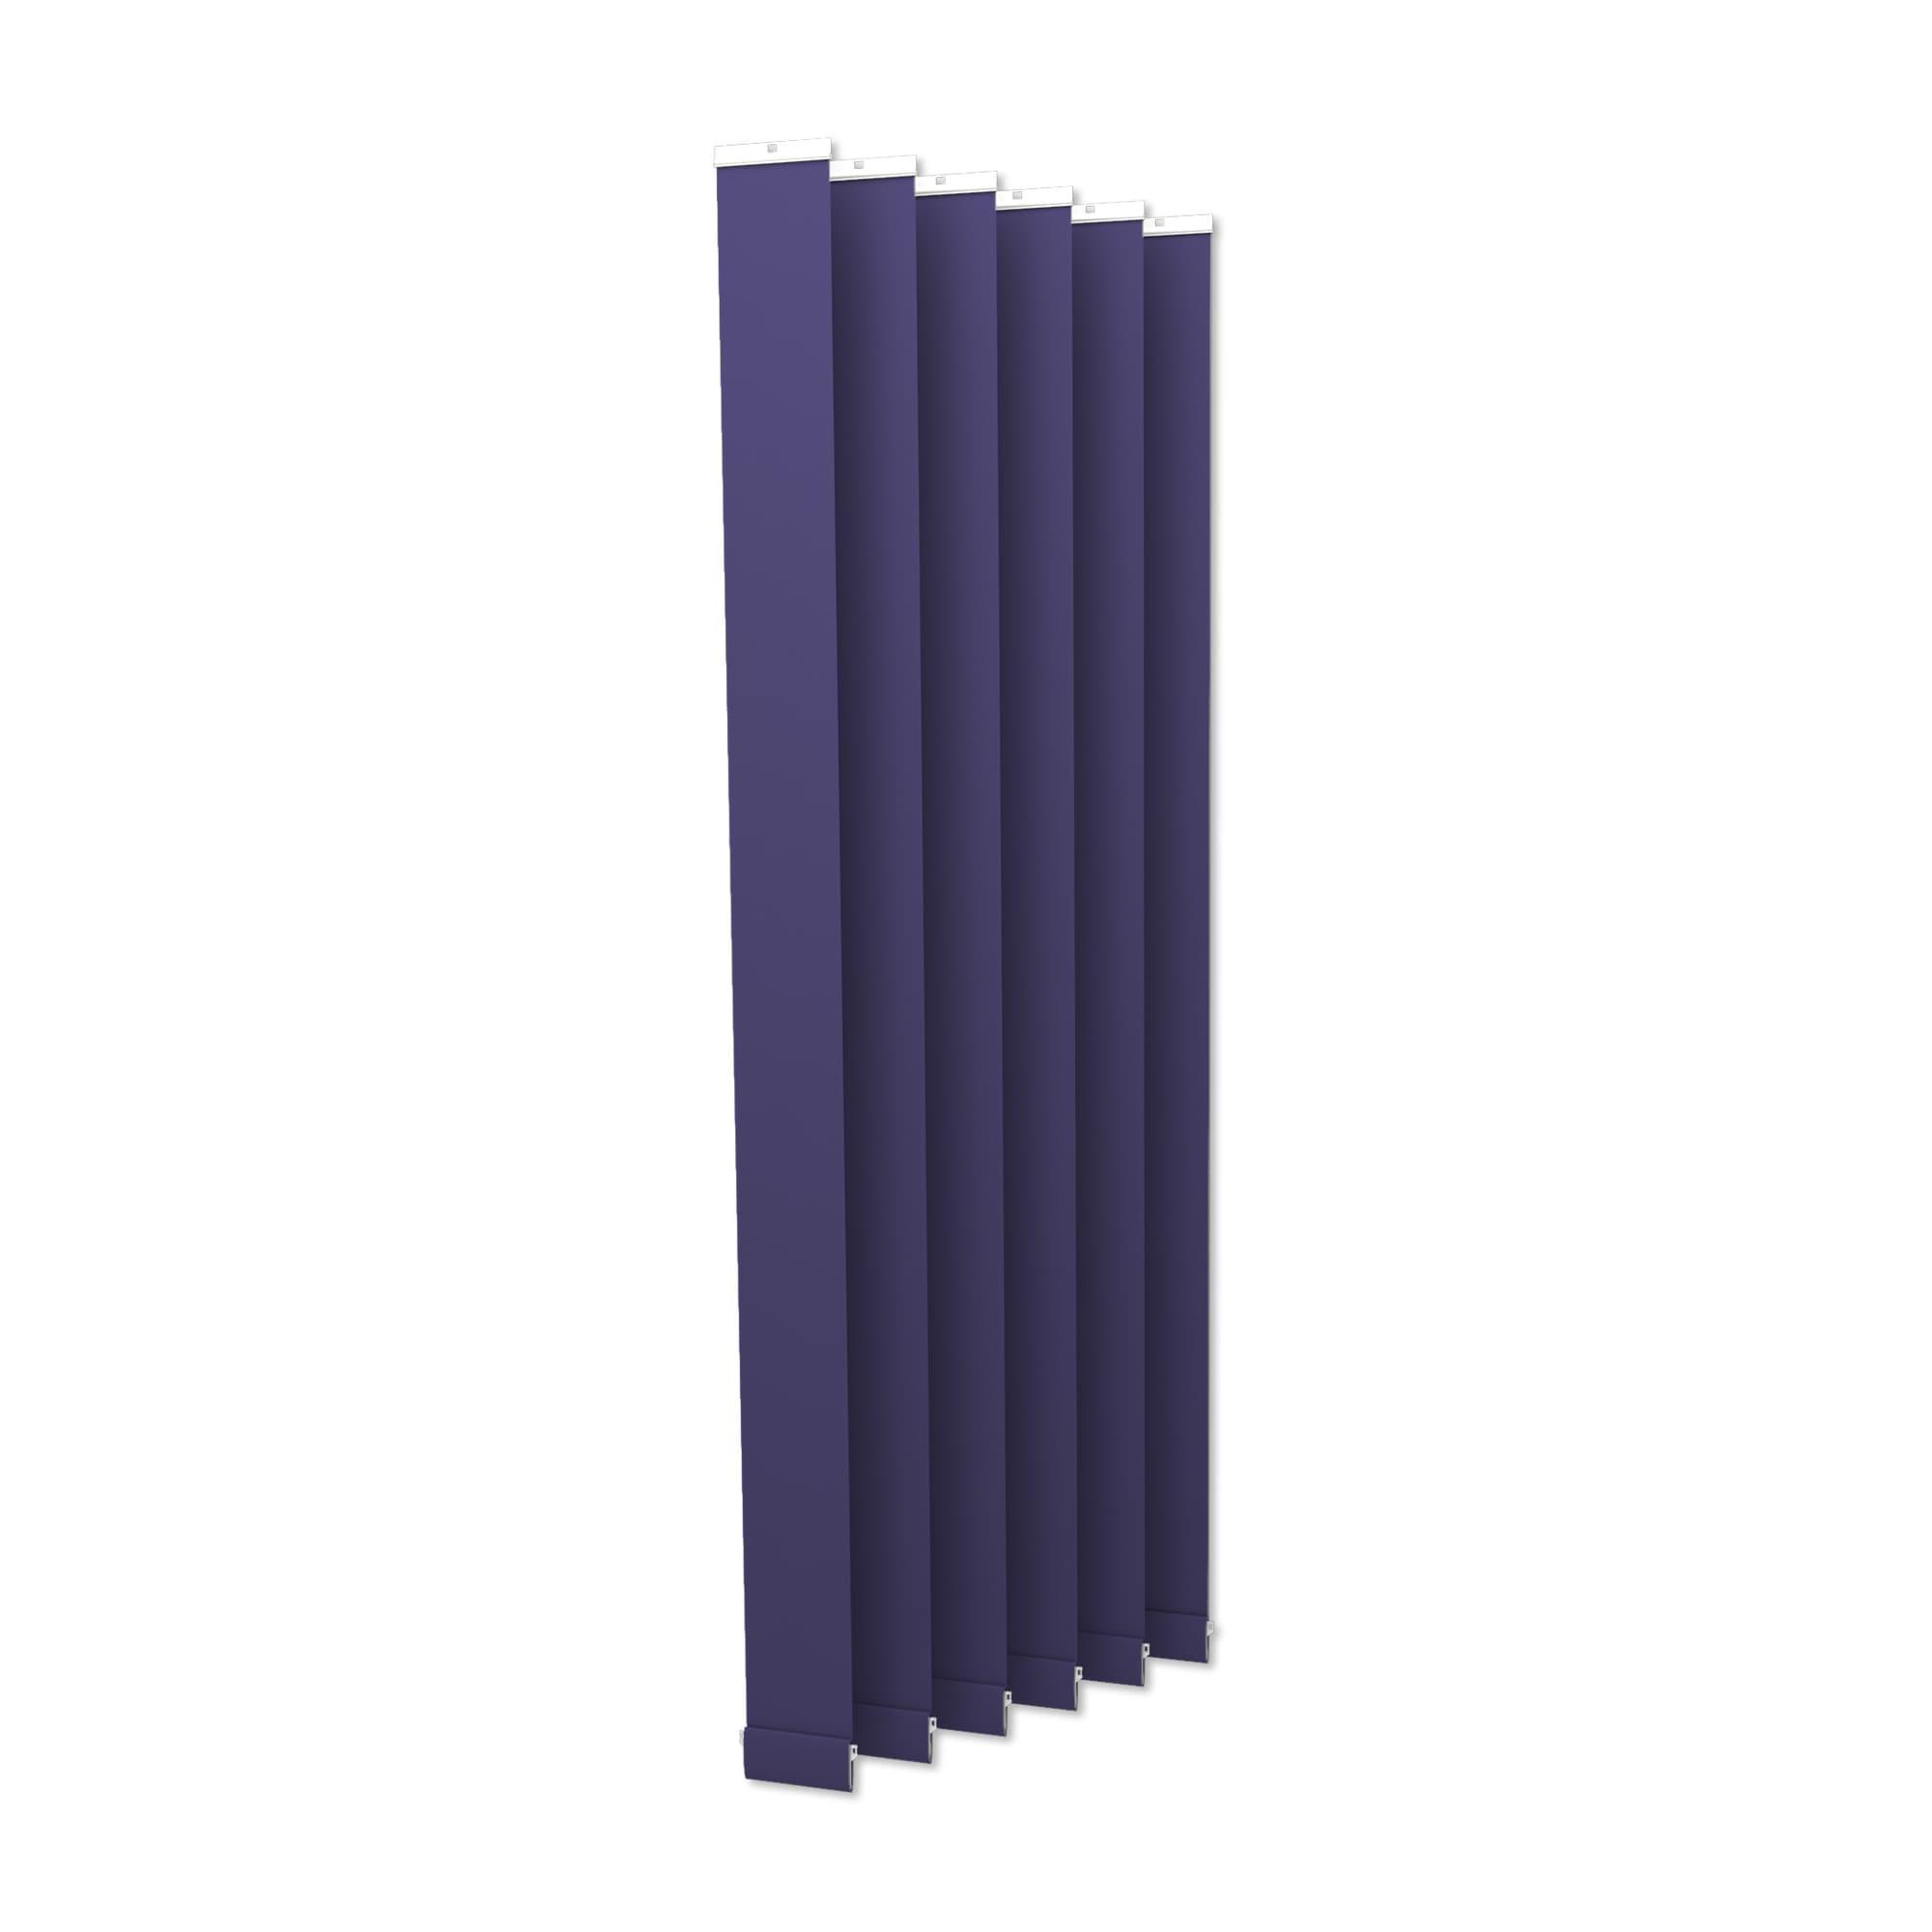 lamellenvorhang 89mm vertikaljalousie schiebevorhang ersatzlamellen victoria m ebay. Black Bedroom Furniture Sets. Home Design Ideas